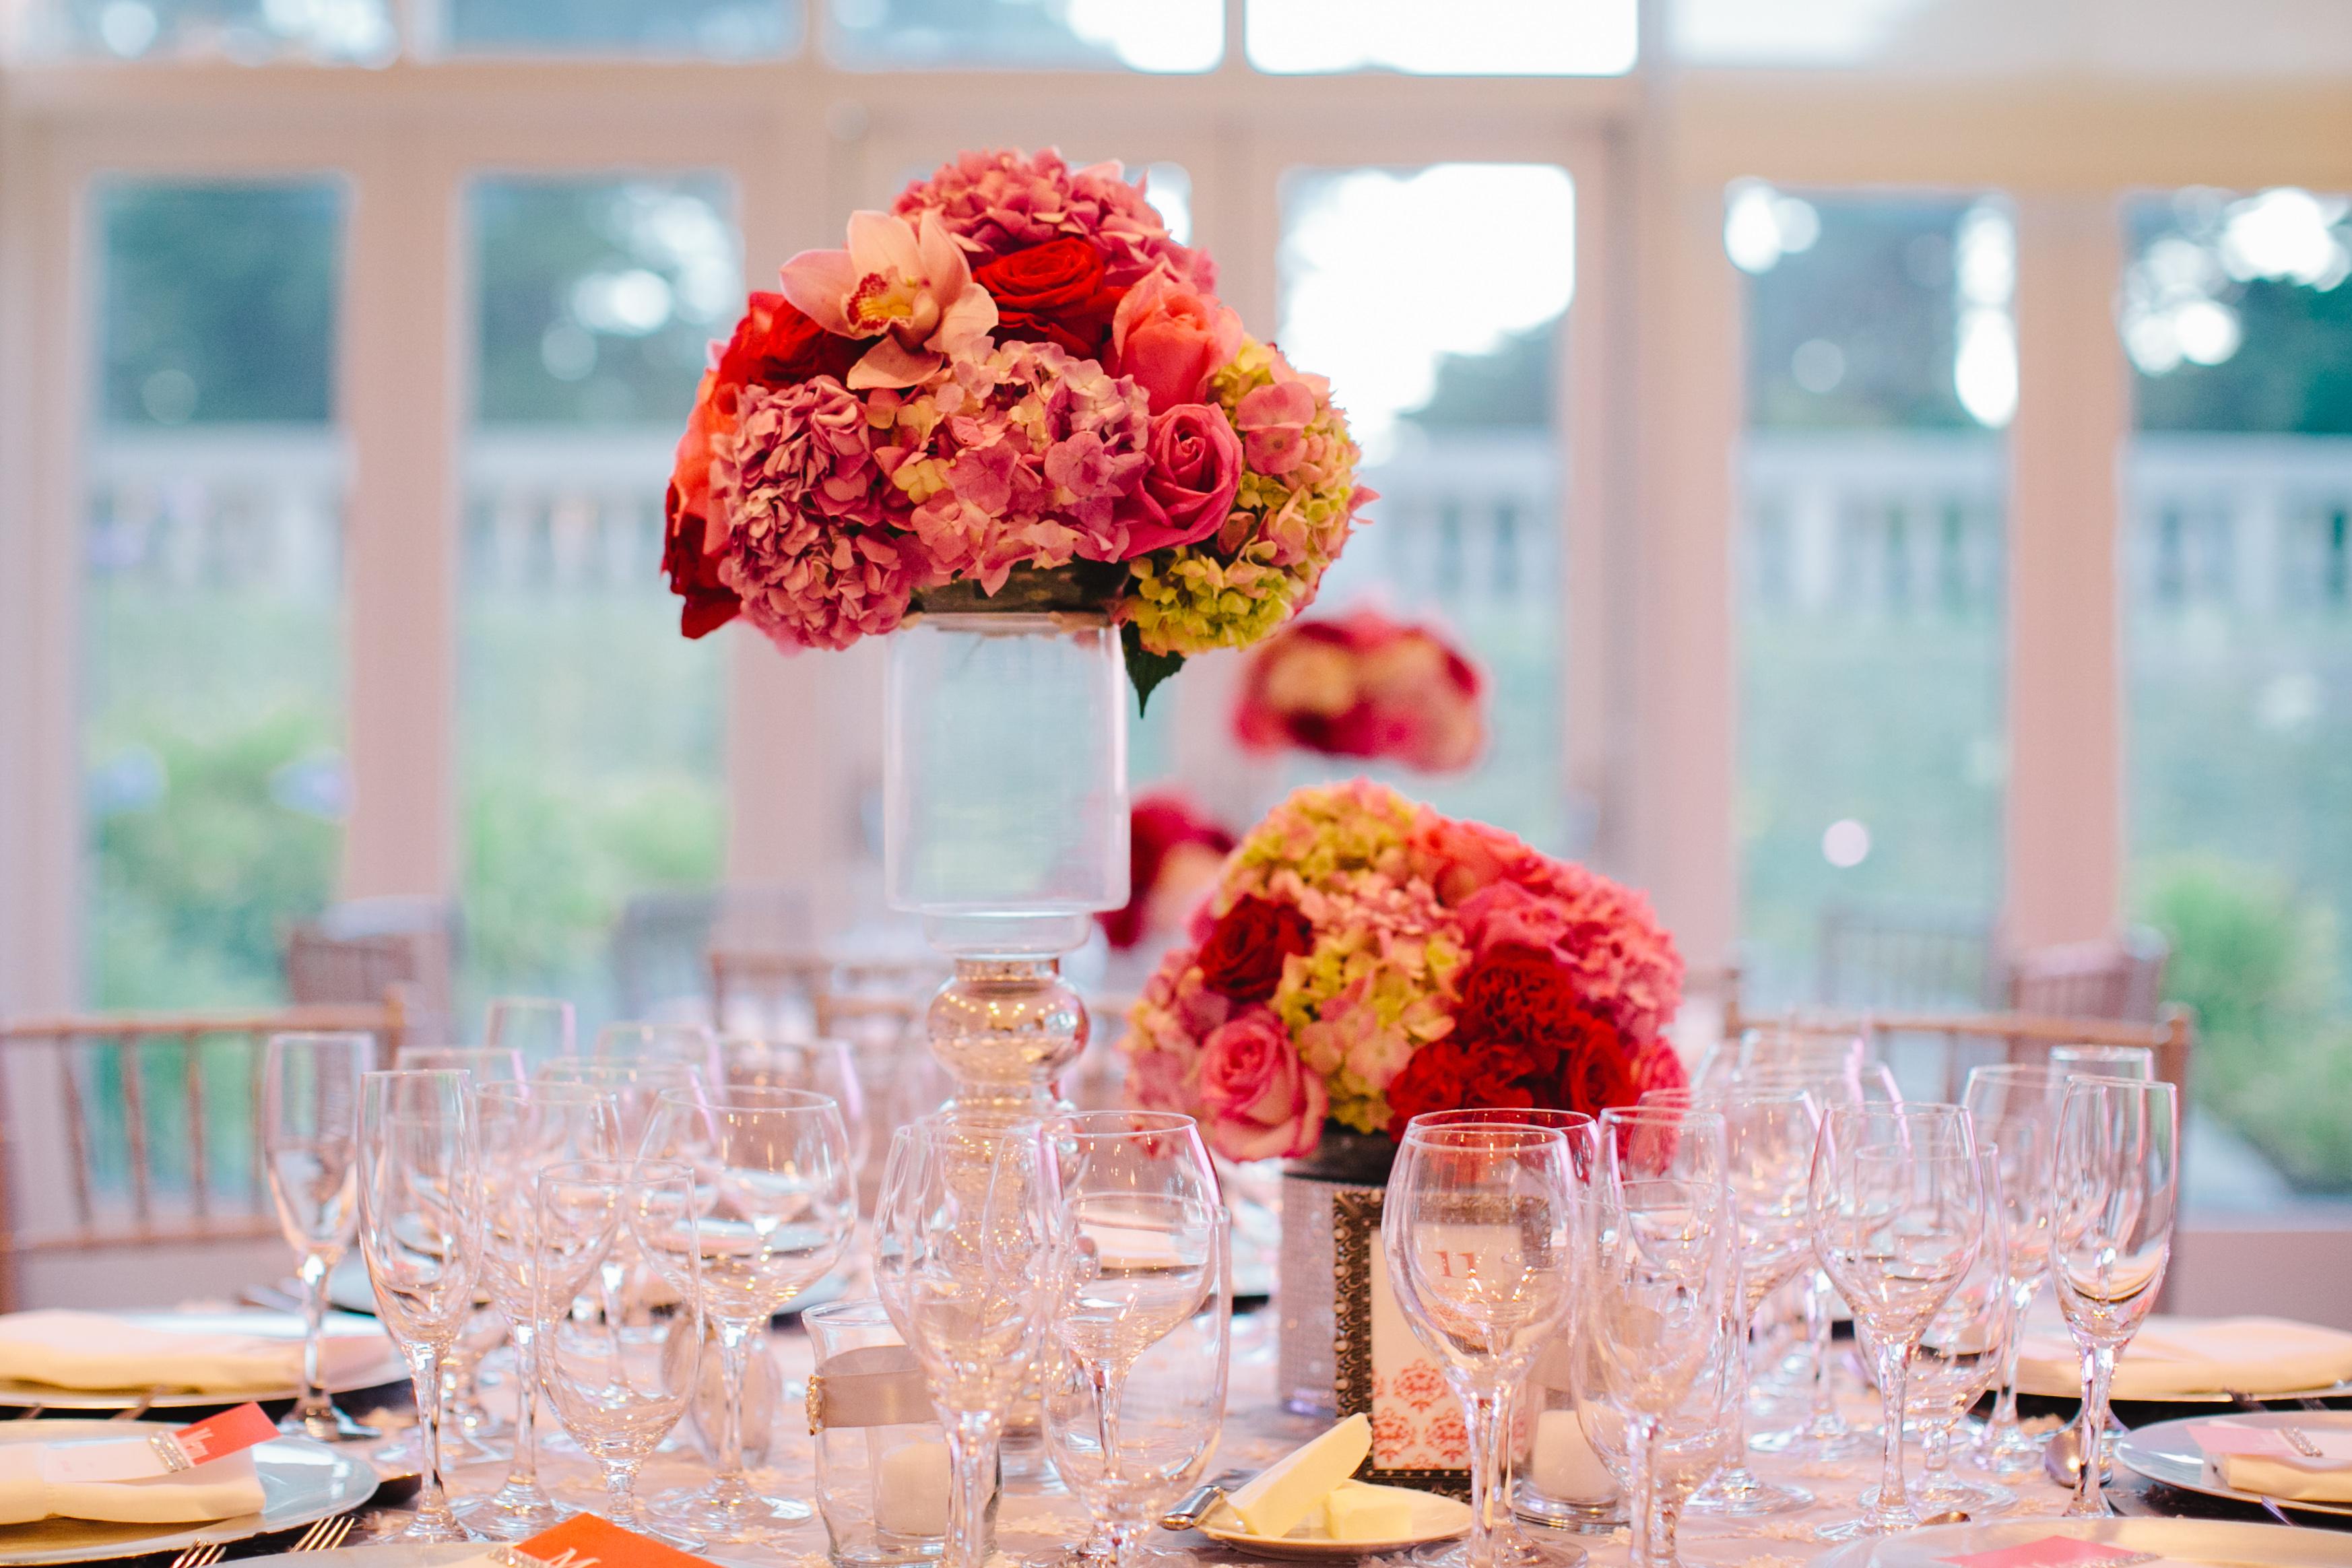 Reception, Flowers & Decor, Real Weddings, Wedding Style, red, Centerpieces, Fall Weddings, West Coast Real Weddings, Fall Real Weddings, Crimson, West Coast Weddings, Romantic Real Weddings, Glamorous Real Weddings, Glamorous Weddings, Romantic Real Wedding